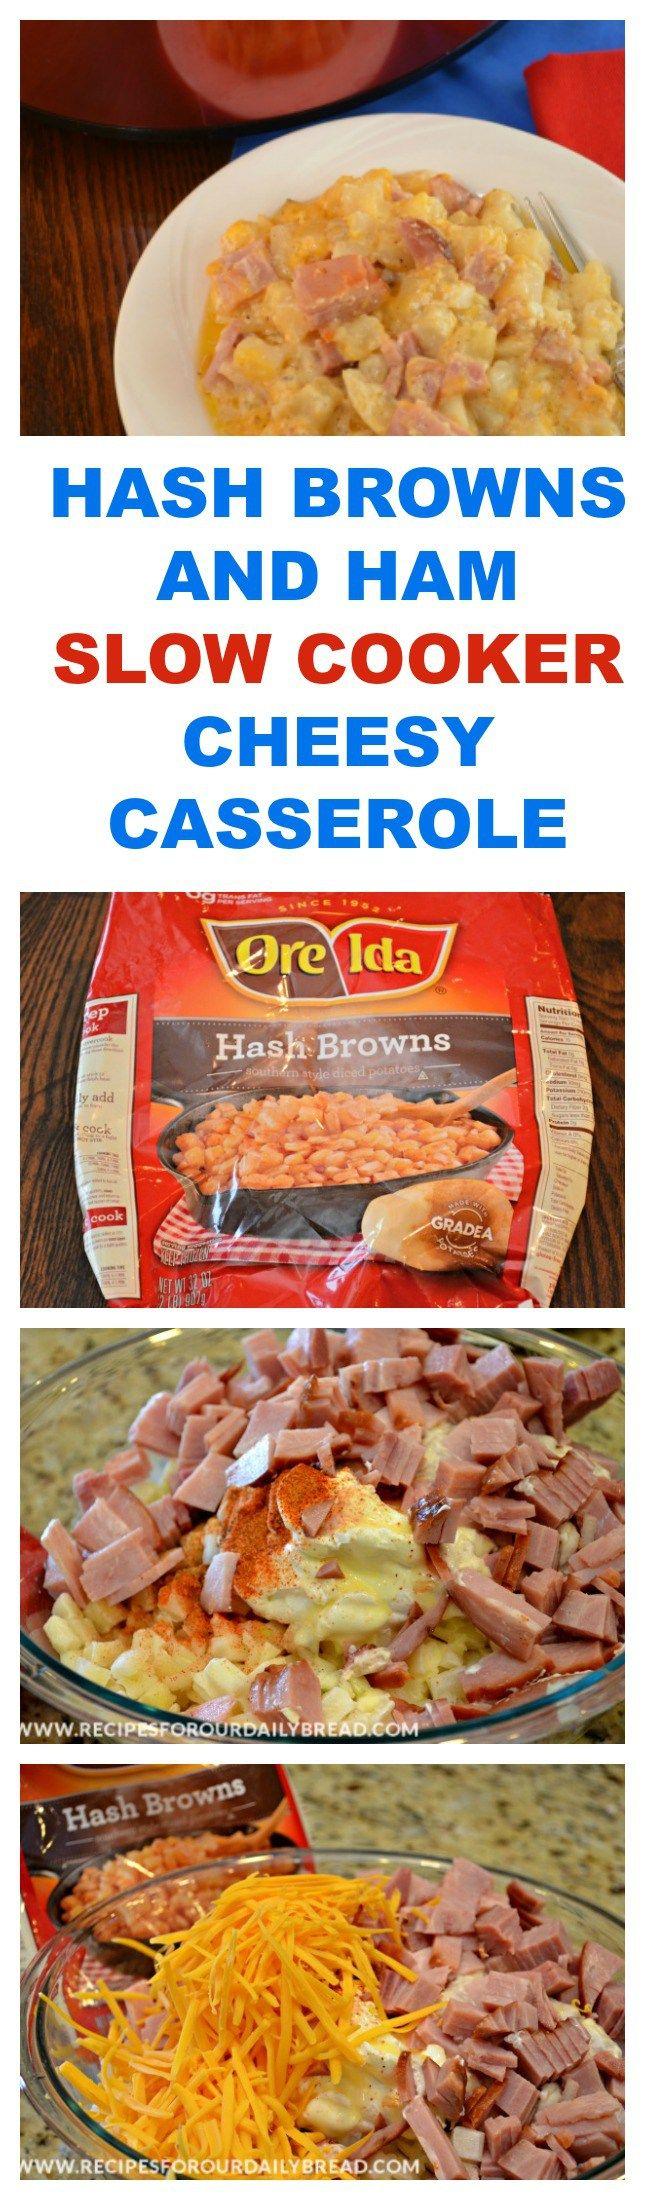 HASH BROWNS AND HAM SLOW COOKER CHEESY CASSEROLE  PRINT RECIPE HERE: http://recipesforourdailybread.com/crock-pot-cheesy-hash-browns-ham/